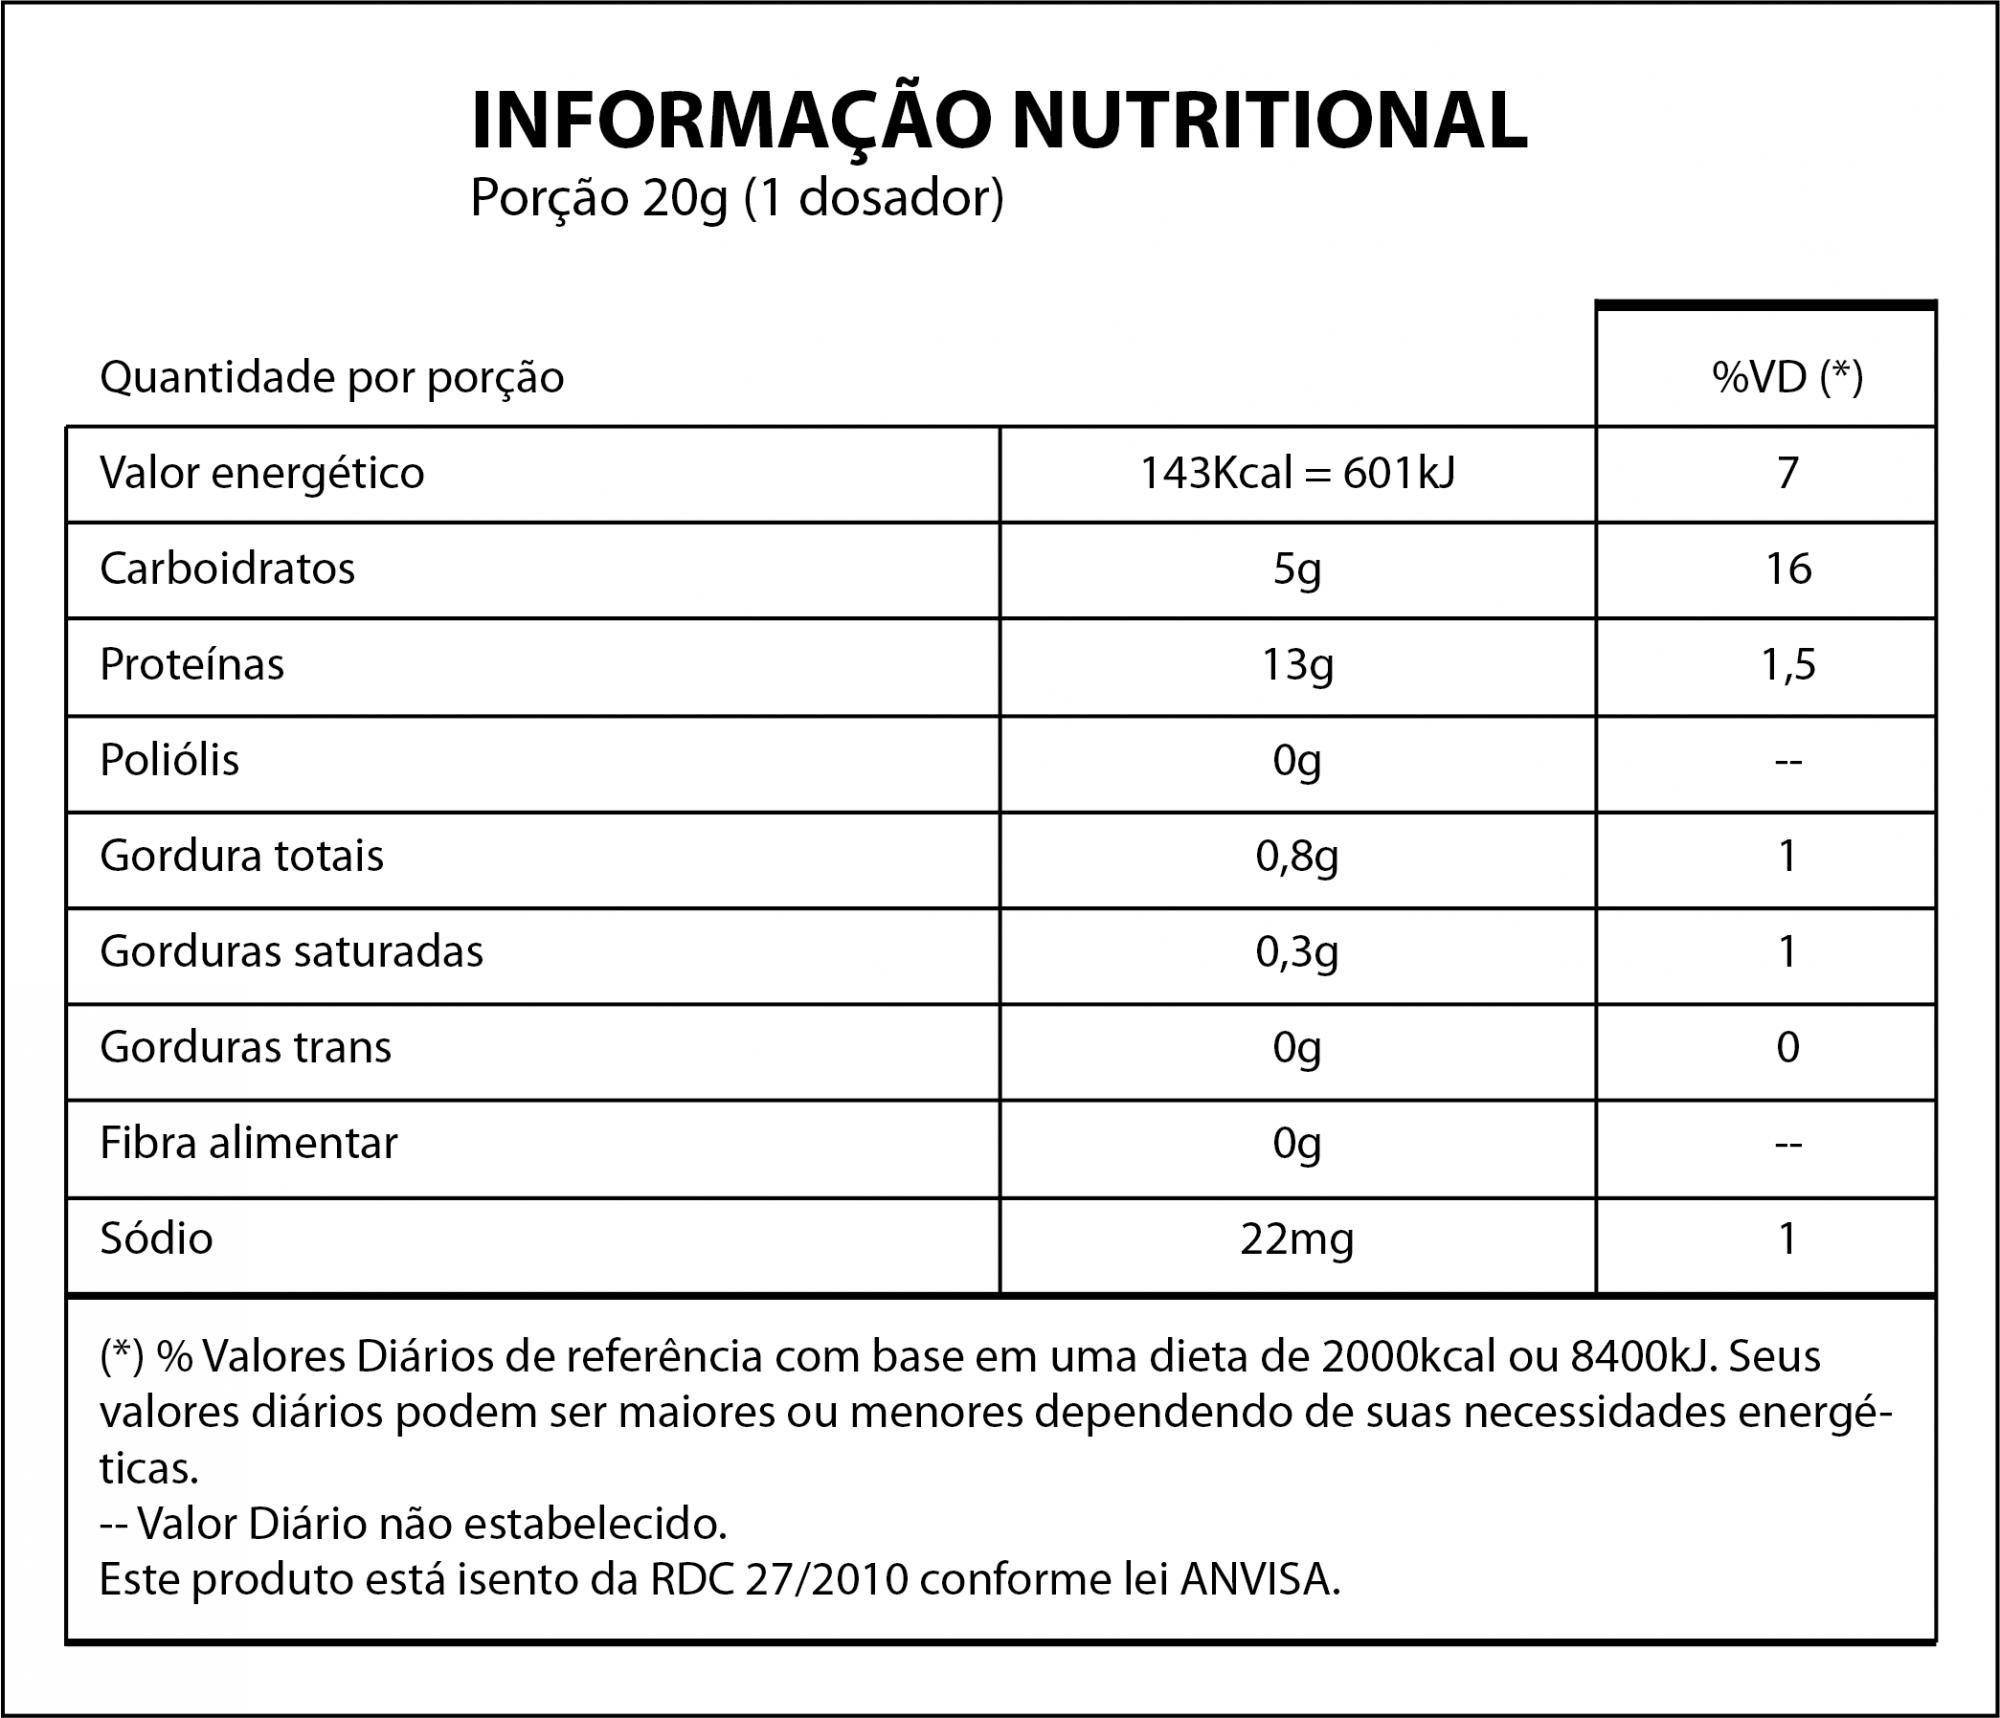 Kit Whey Health Crescimento Muscular - Whey Protein 900g + bcaa 120caps + creatina 150g  + gluta 150g  + coqueteleira